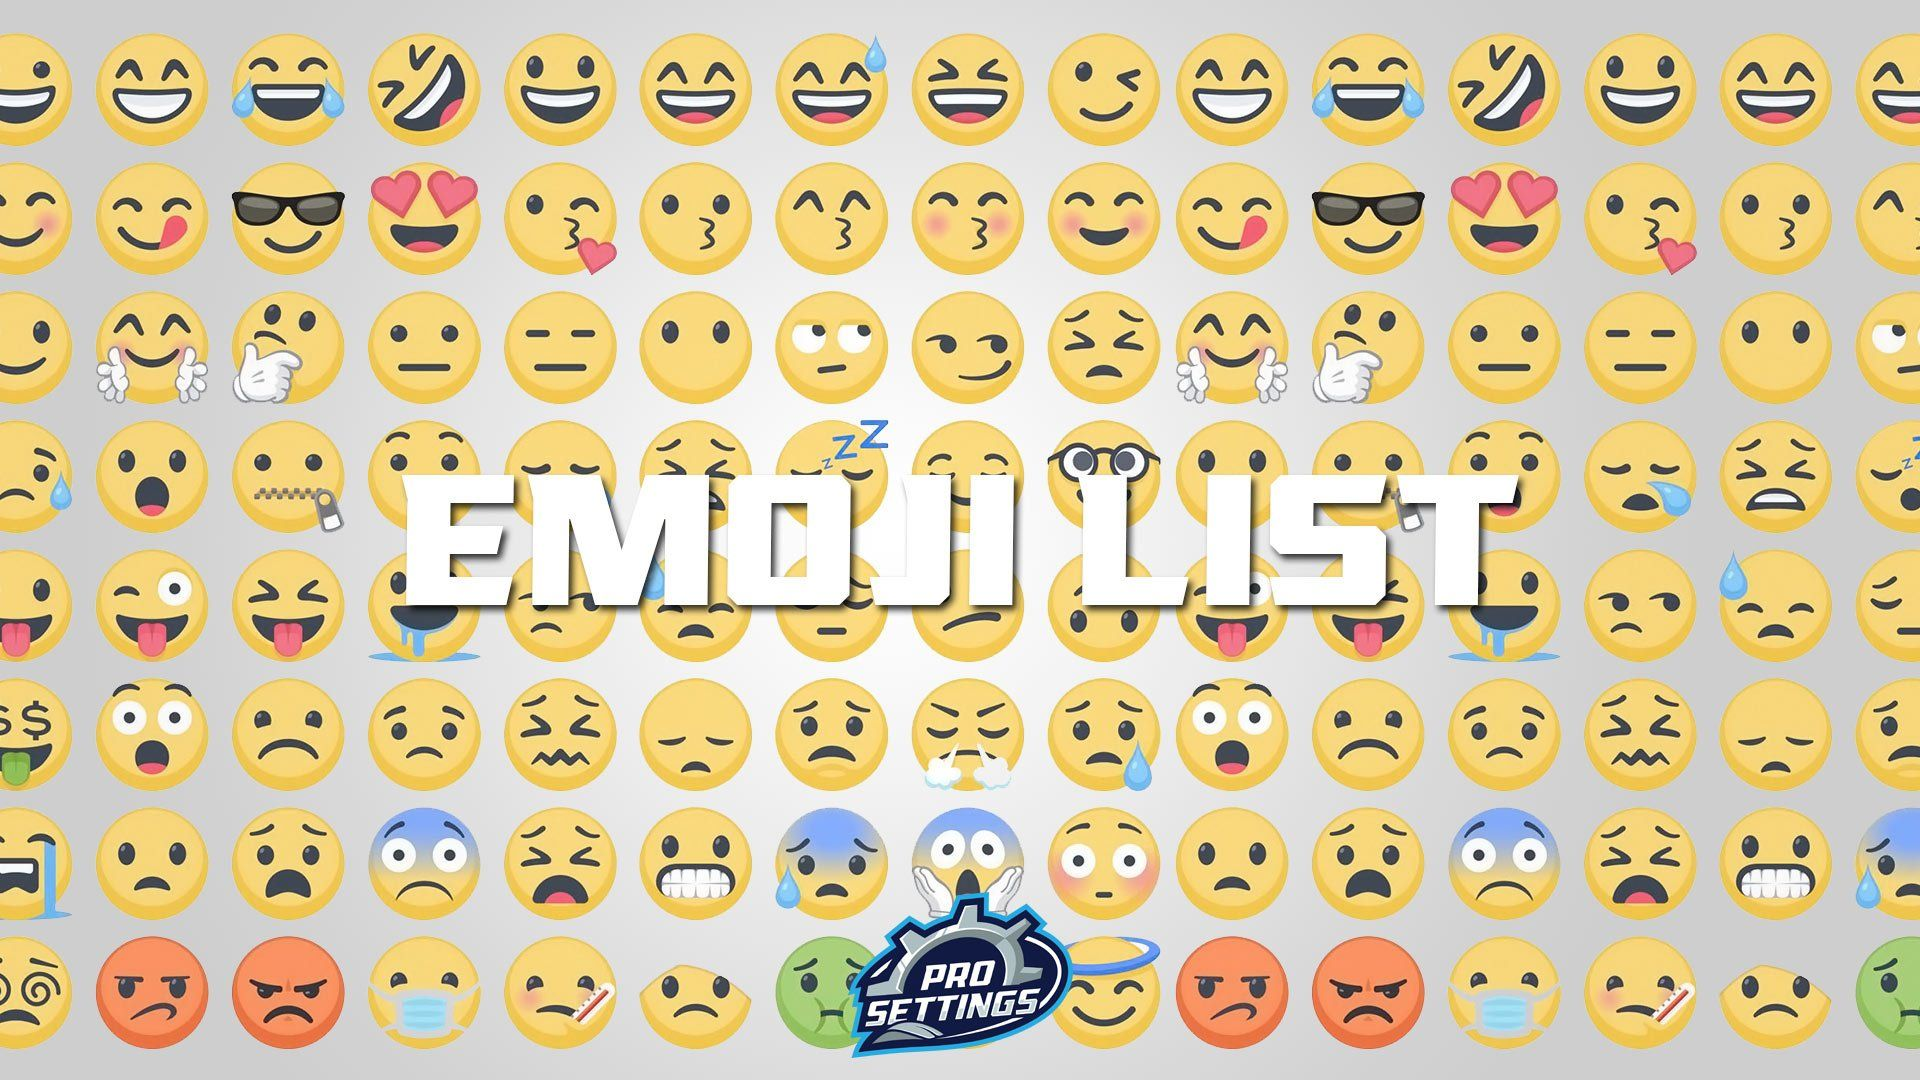 Full List Of Emojis 2020 Prosettings Com Emoji List Emoji Symbols Emoji